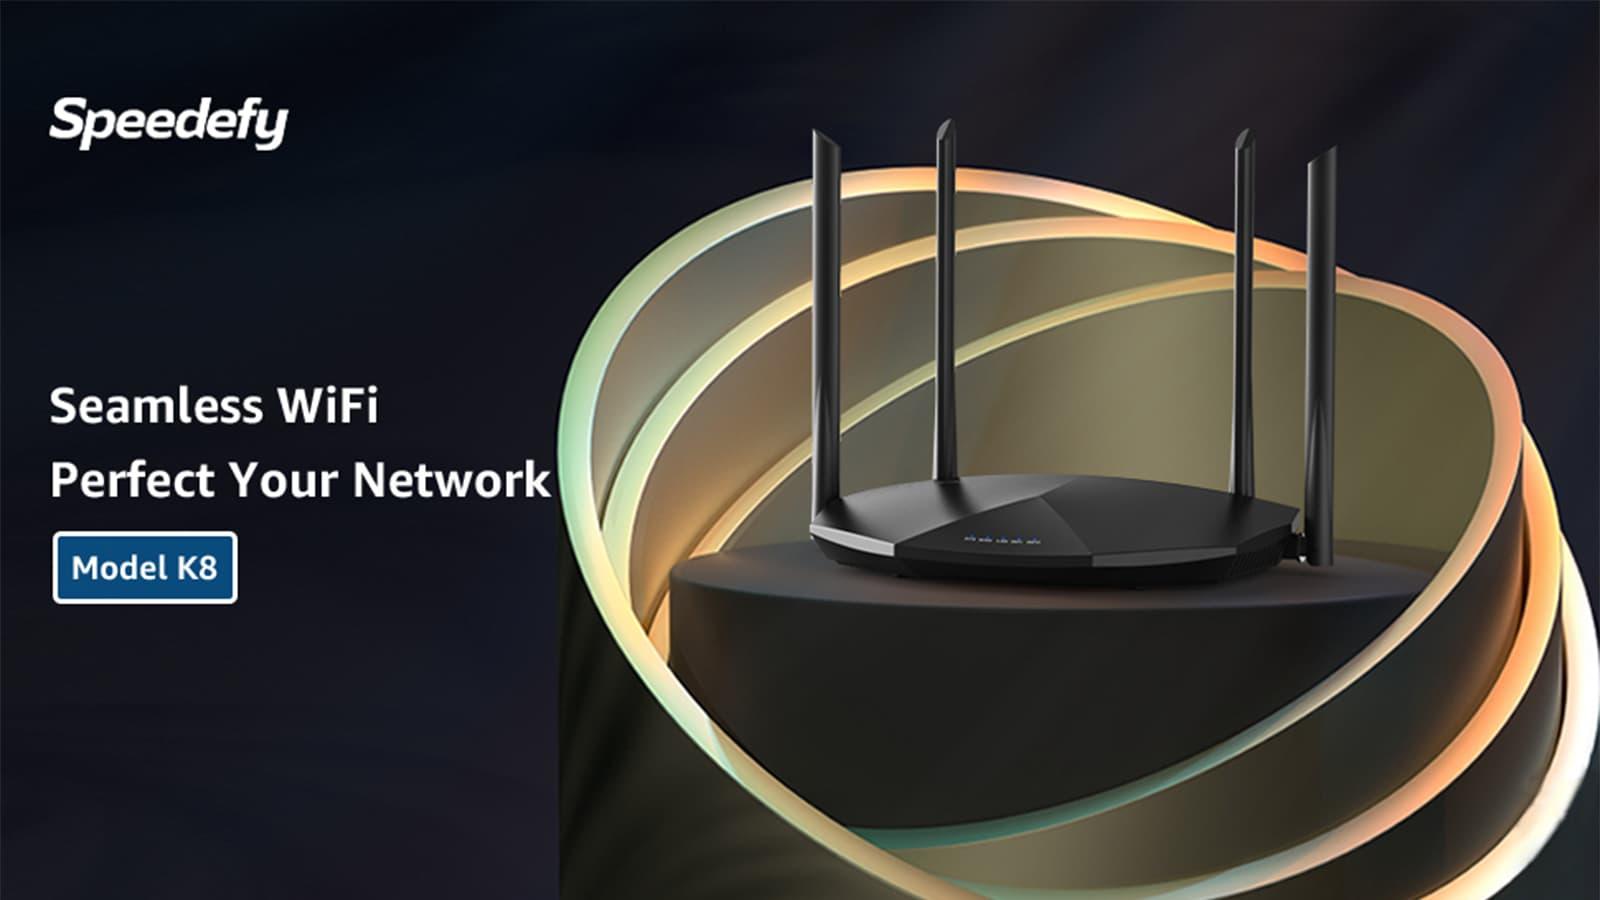 k8 wifi router